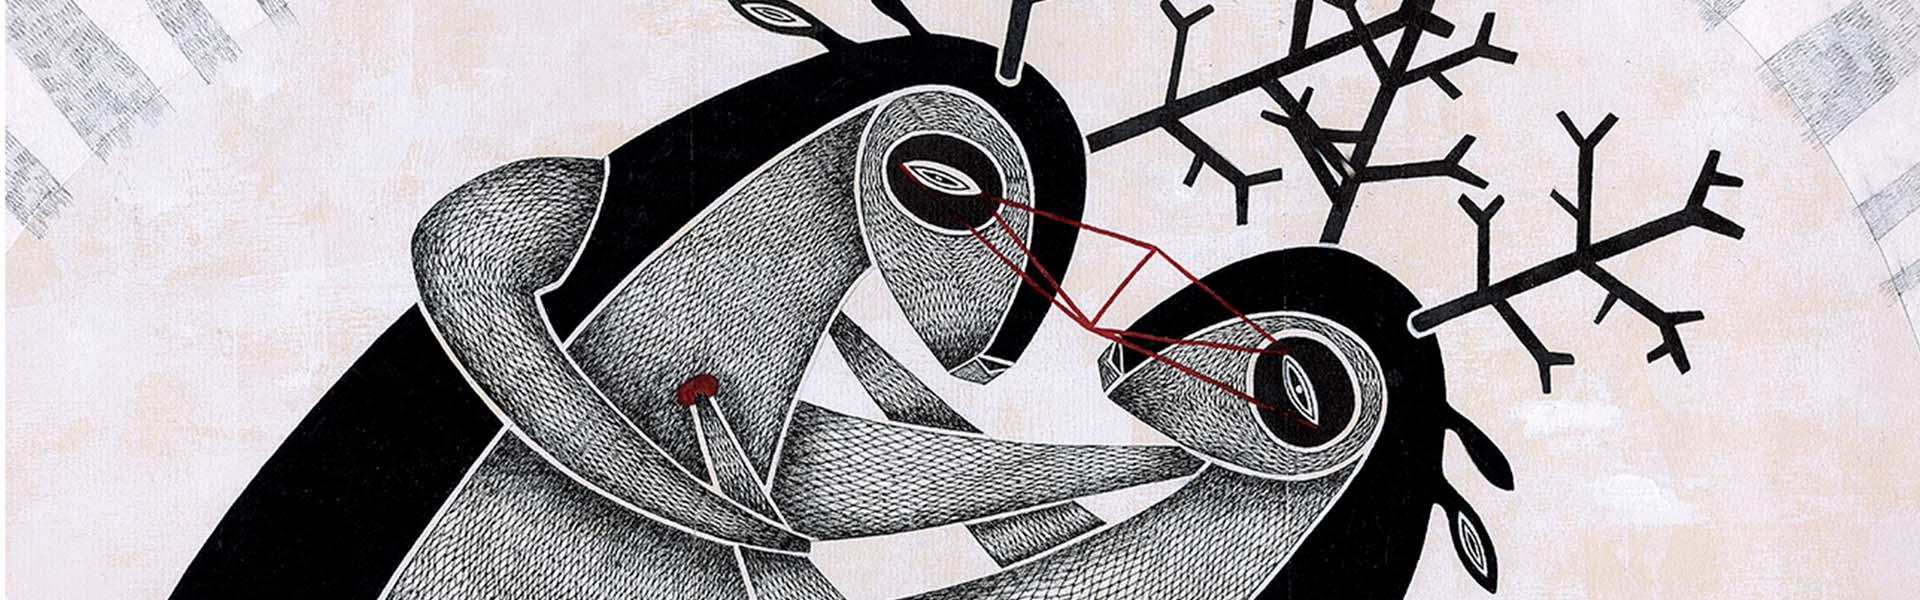 Lo Sguardo by Isoì